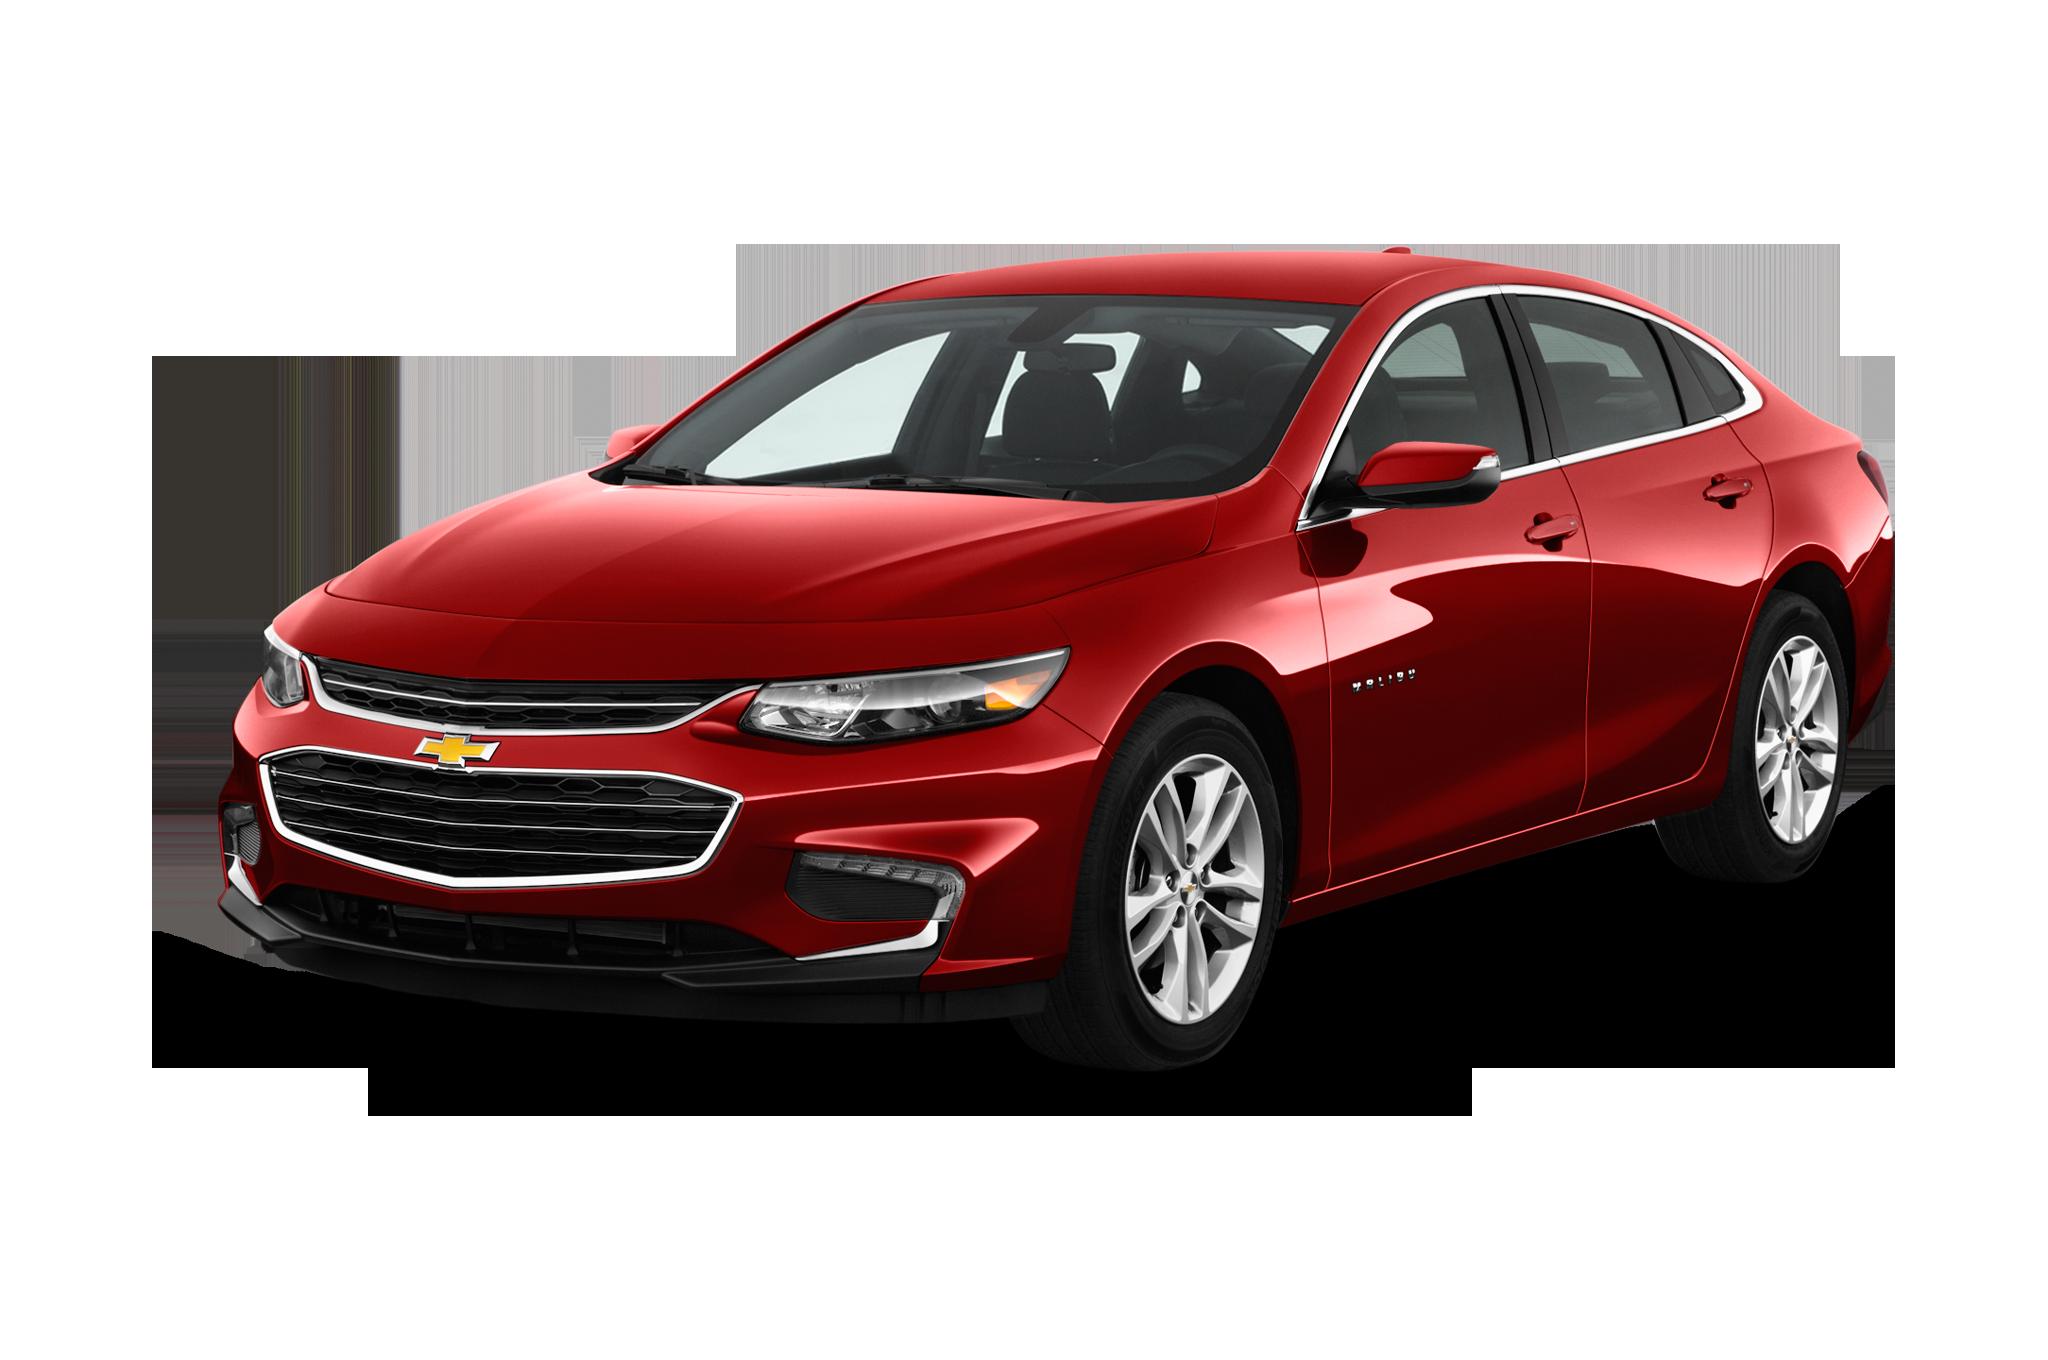 2017 Chevrolet Malibu Reviews.